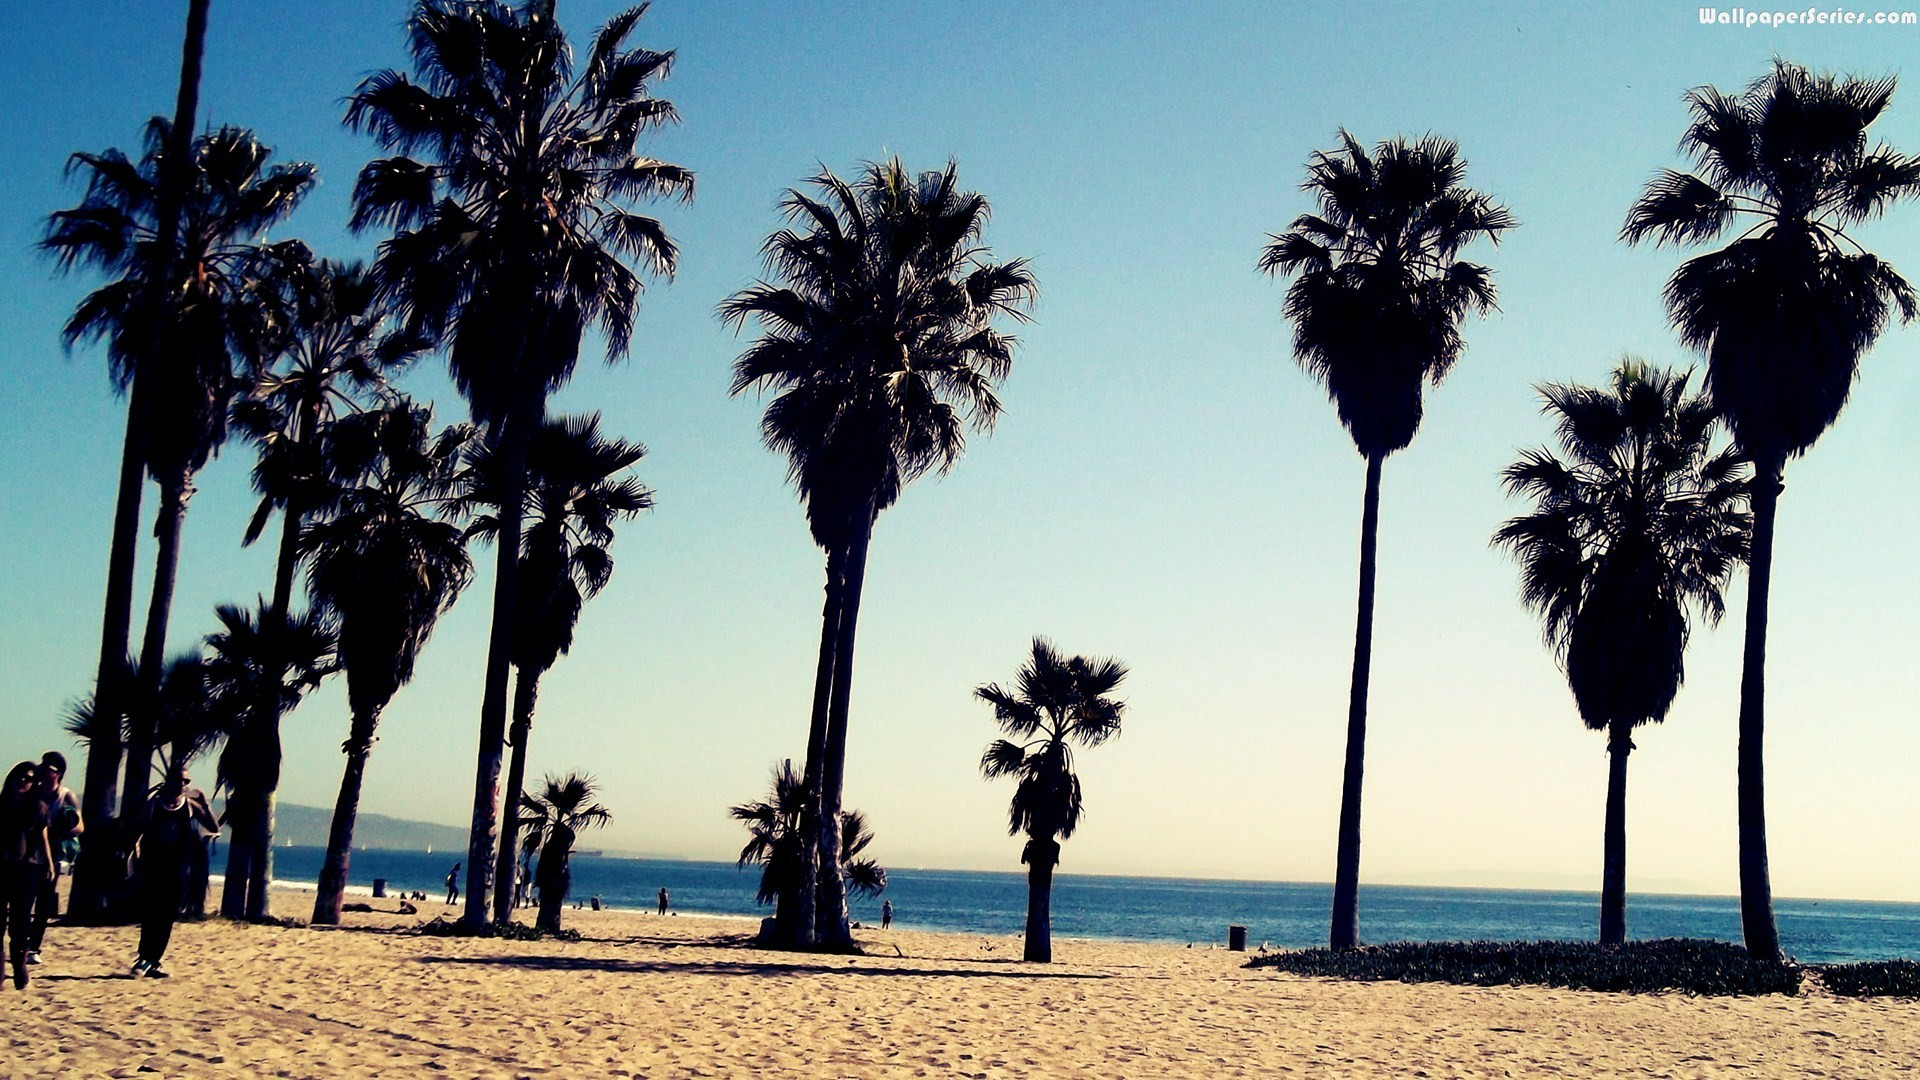 Venice Beach California Wallpaper 67 images 1920x1080